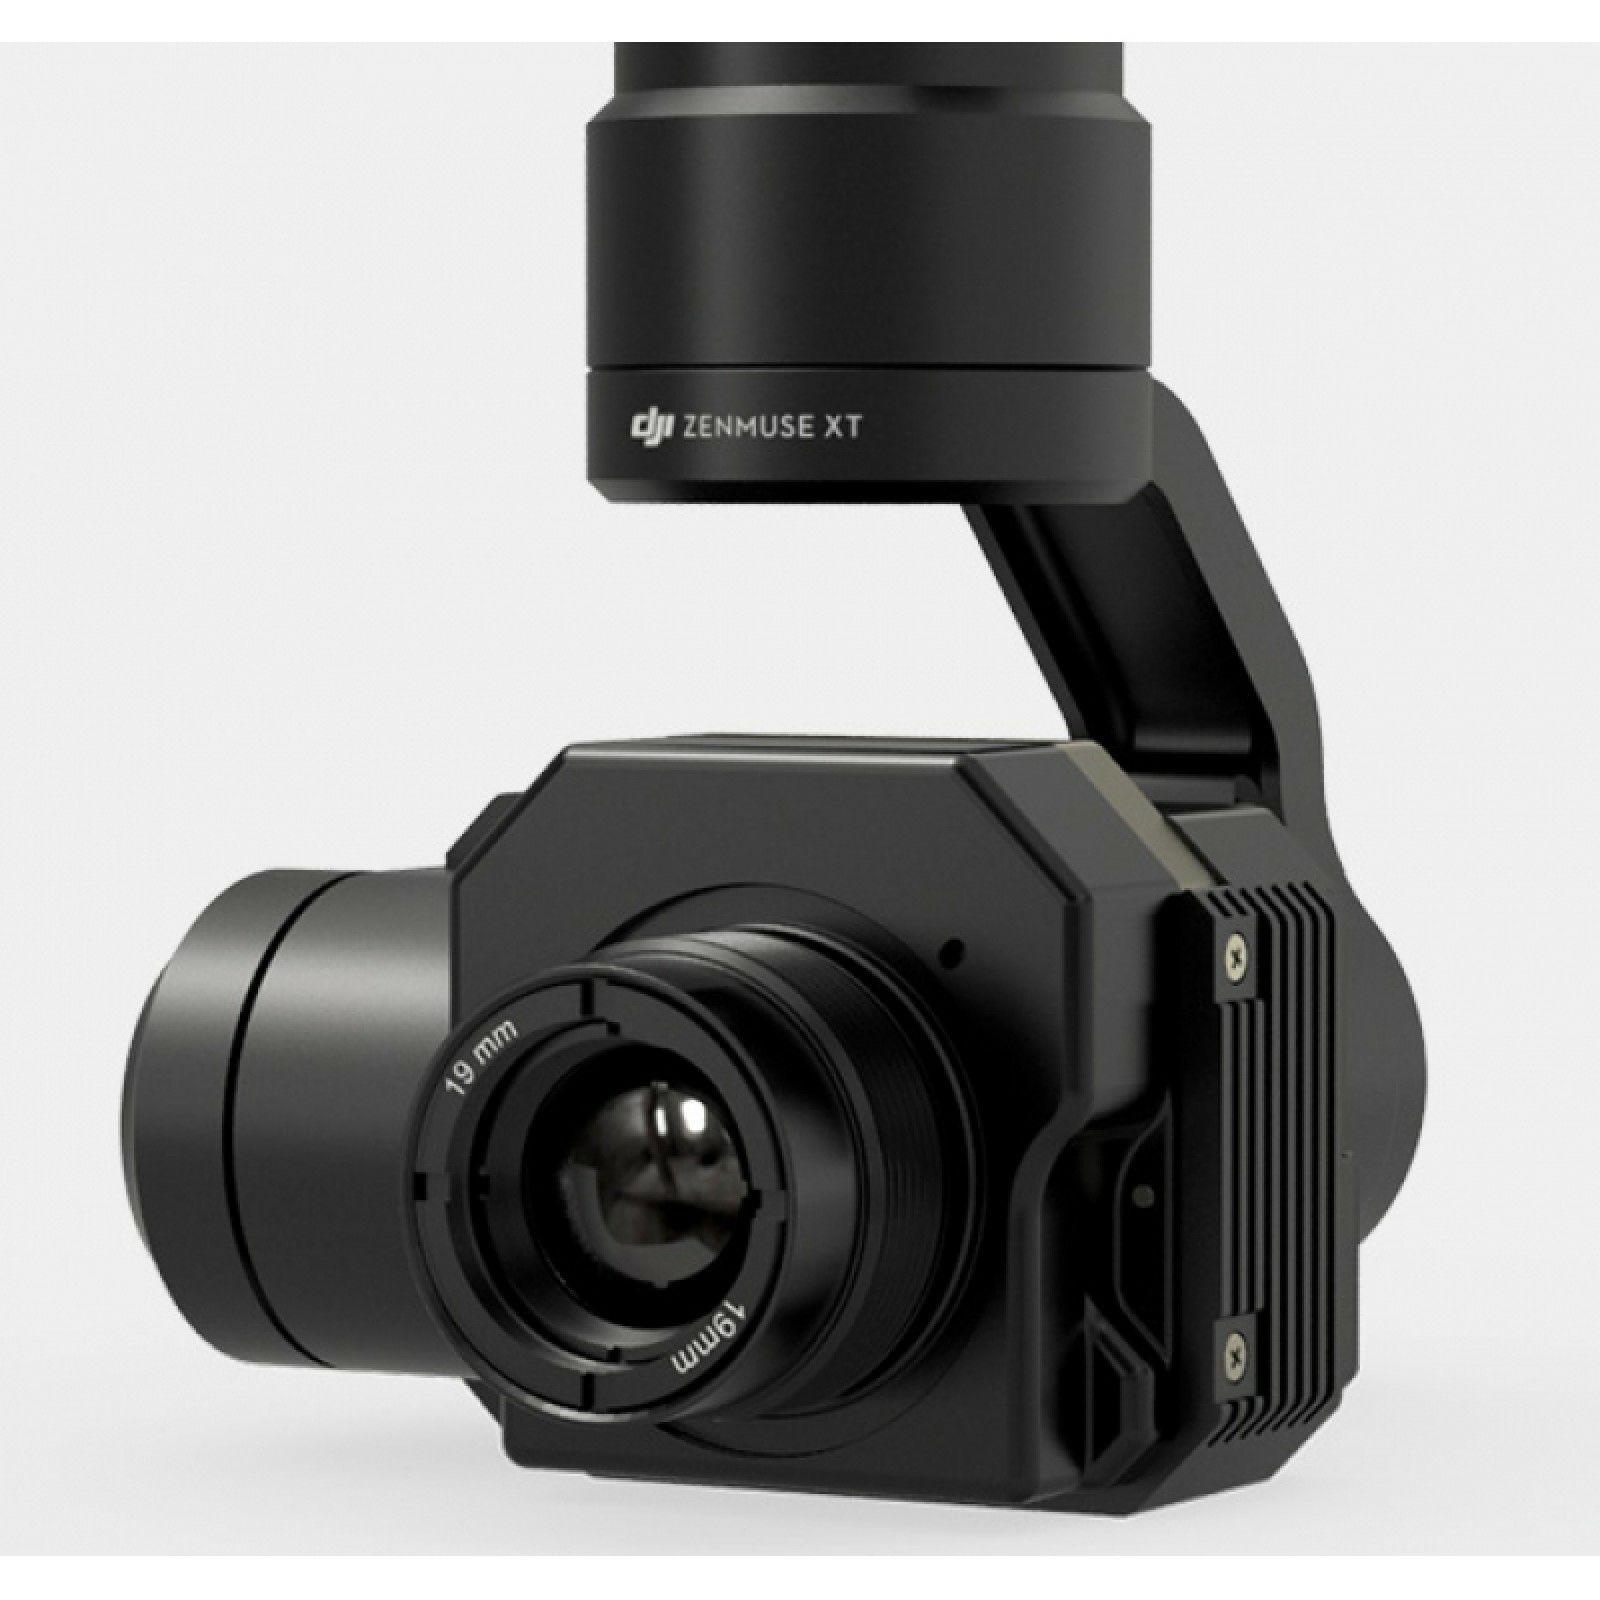 DJI Zenmuse XT Thermal Camera ZXTA09FR 640x512 30Hz (Fast frame) Lens 9mm objektiv termovizijska kamera (radiometry temperature measurement model)